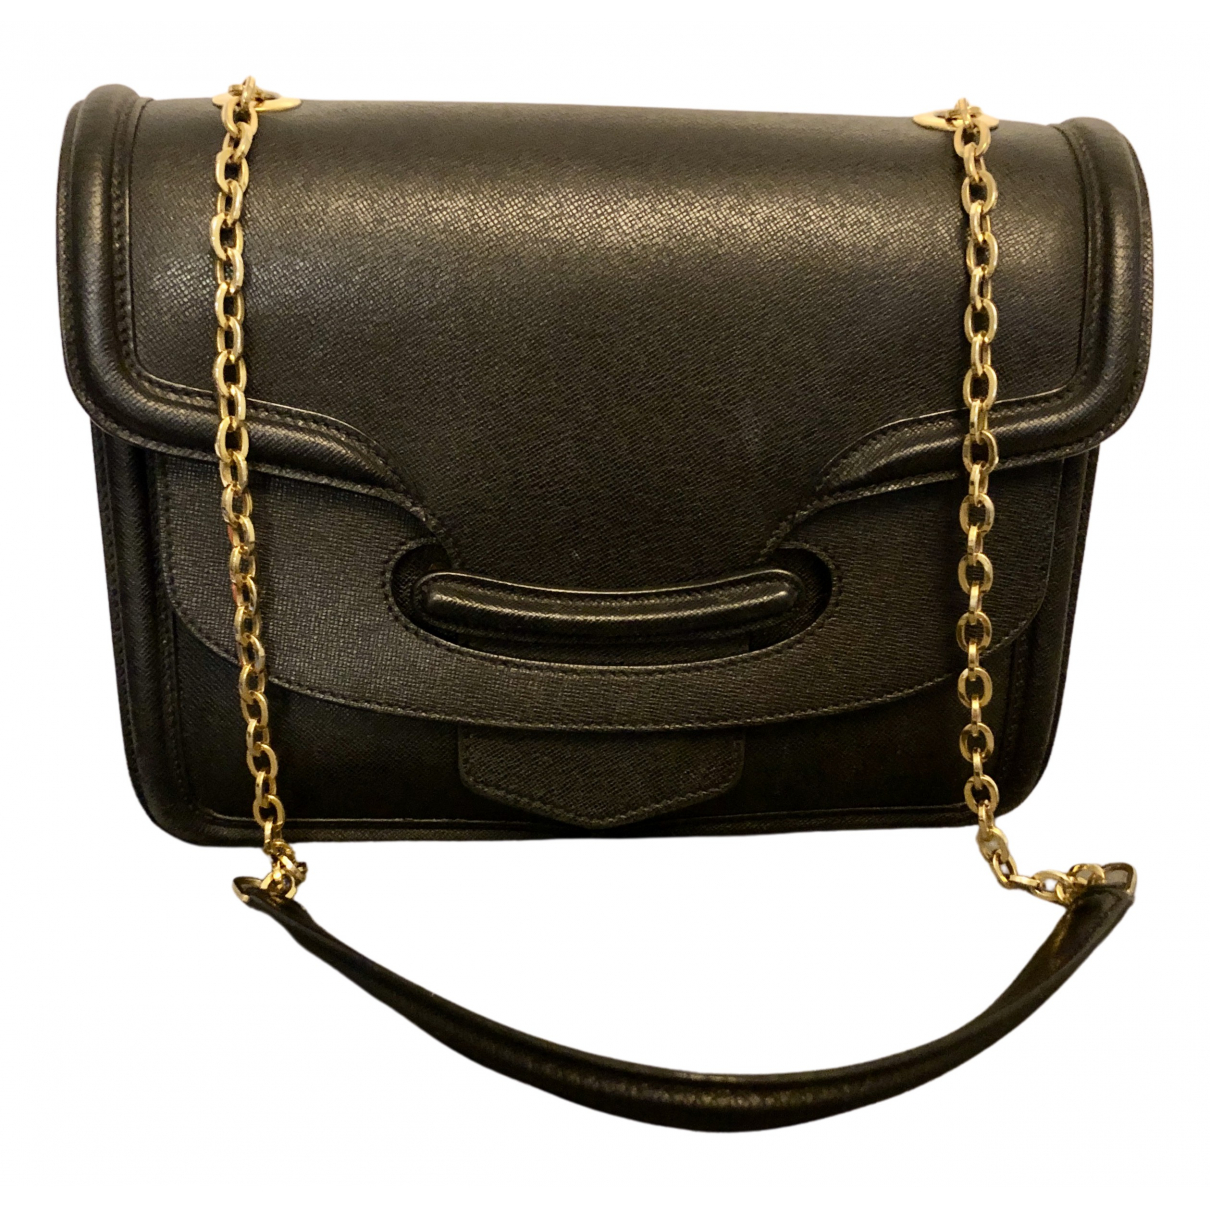 Alexander Mcqueen Heroine Chain Handtasche in  Schwarz Leder